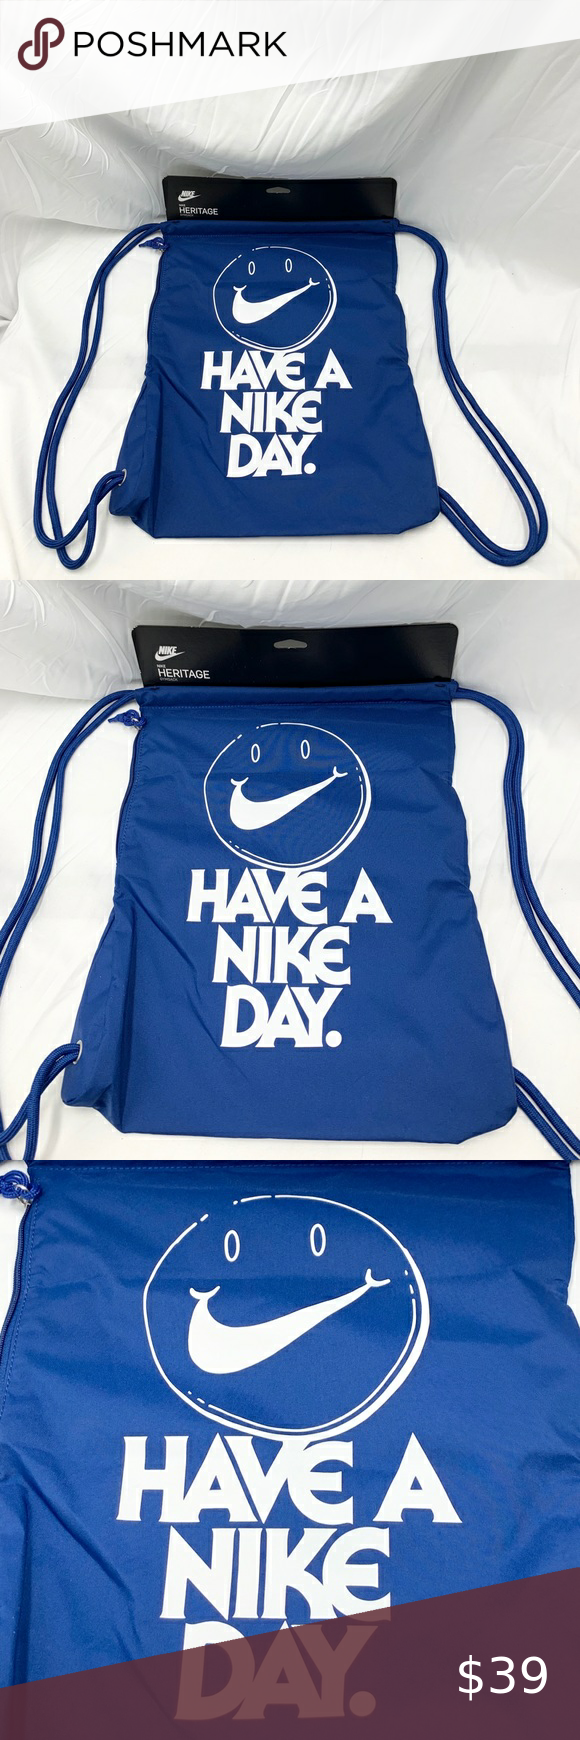 Nike Unisex Heritage Gym Sack Bag Sack Bag Gym Sack Clothes Design